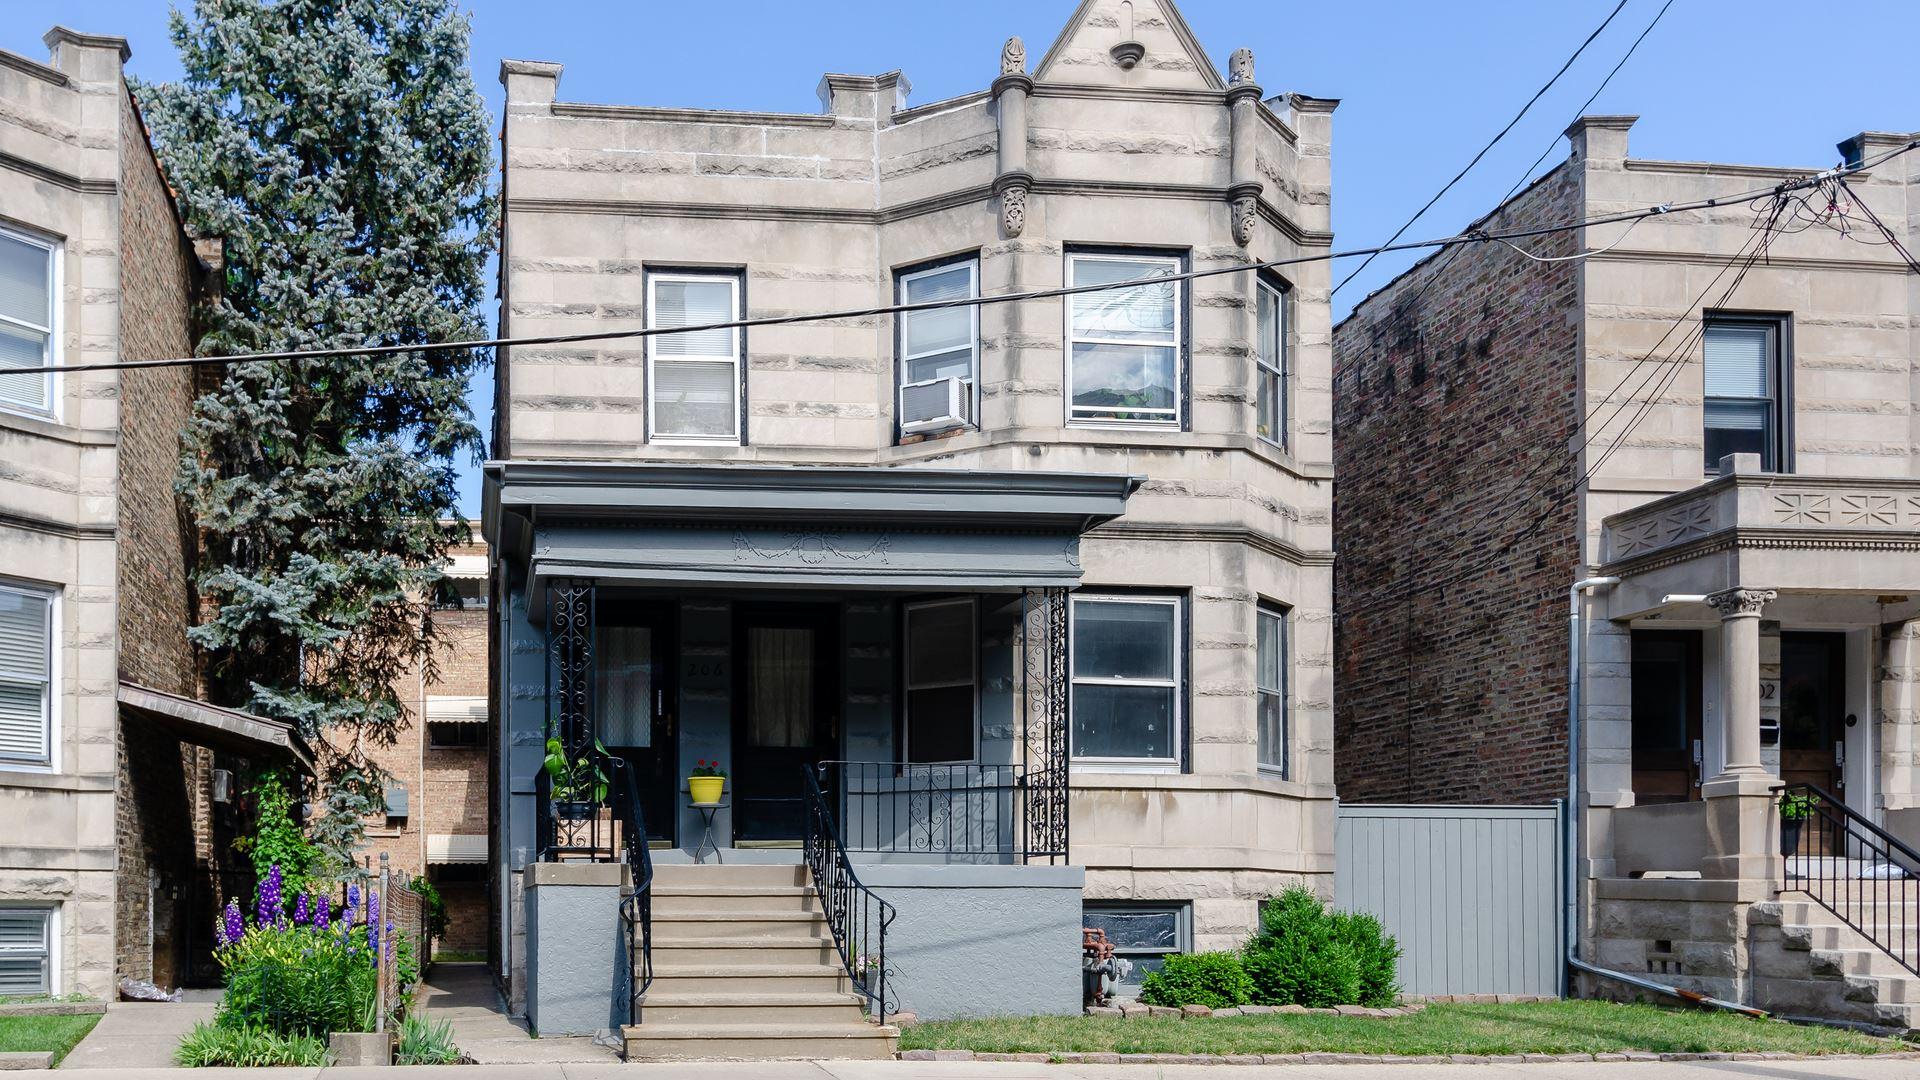 206 N Marion Street, Oak Park, IL 60302 - #: 11124548